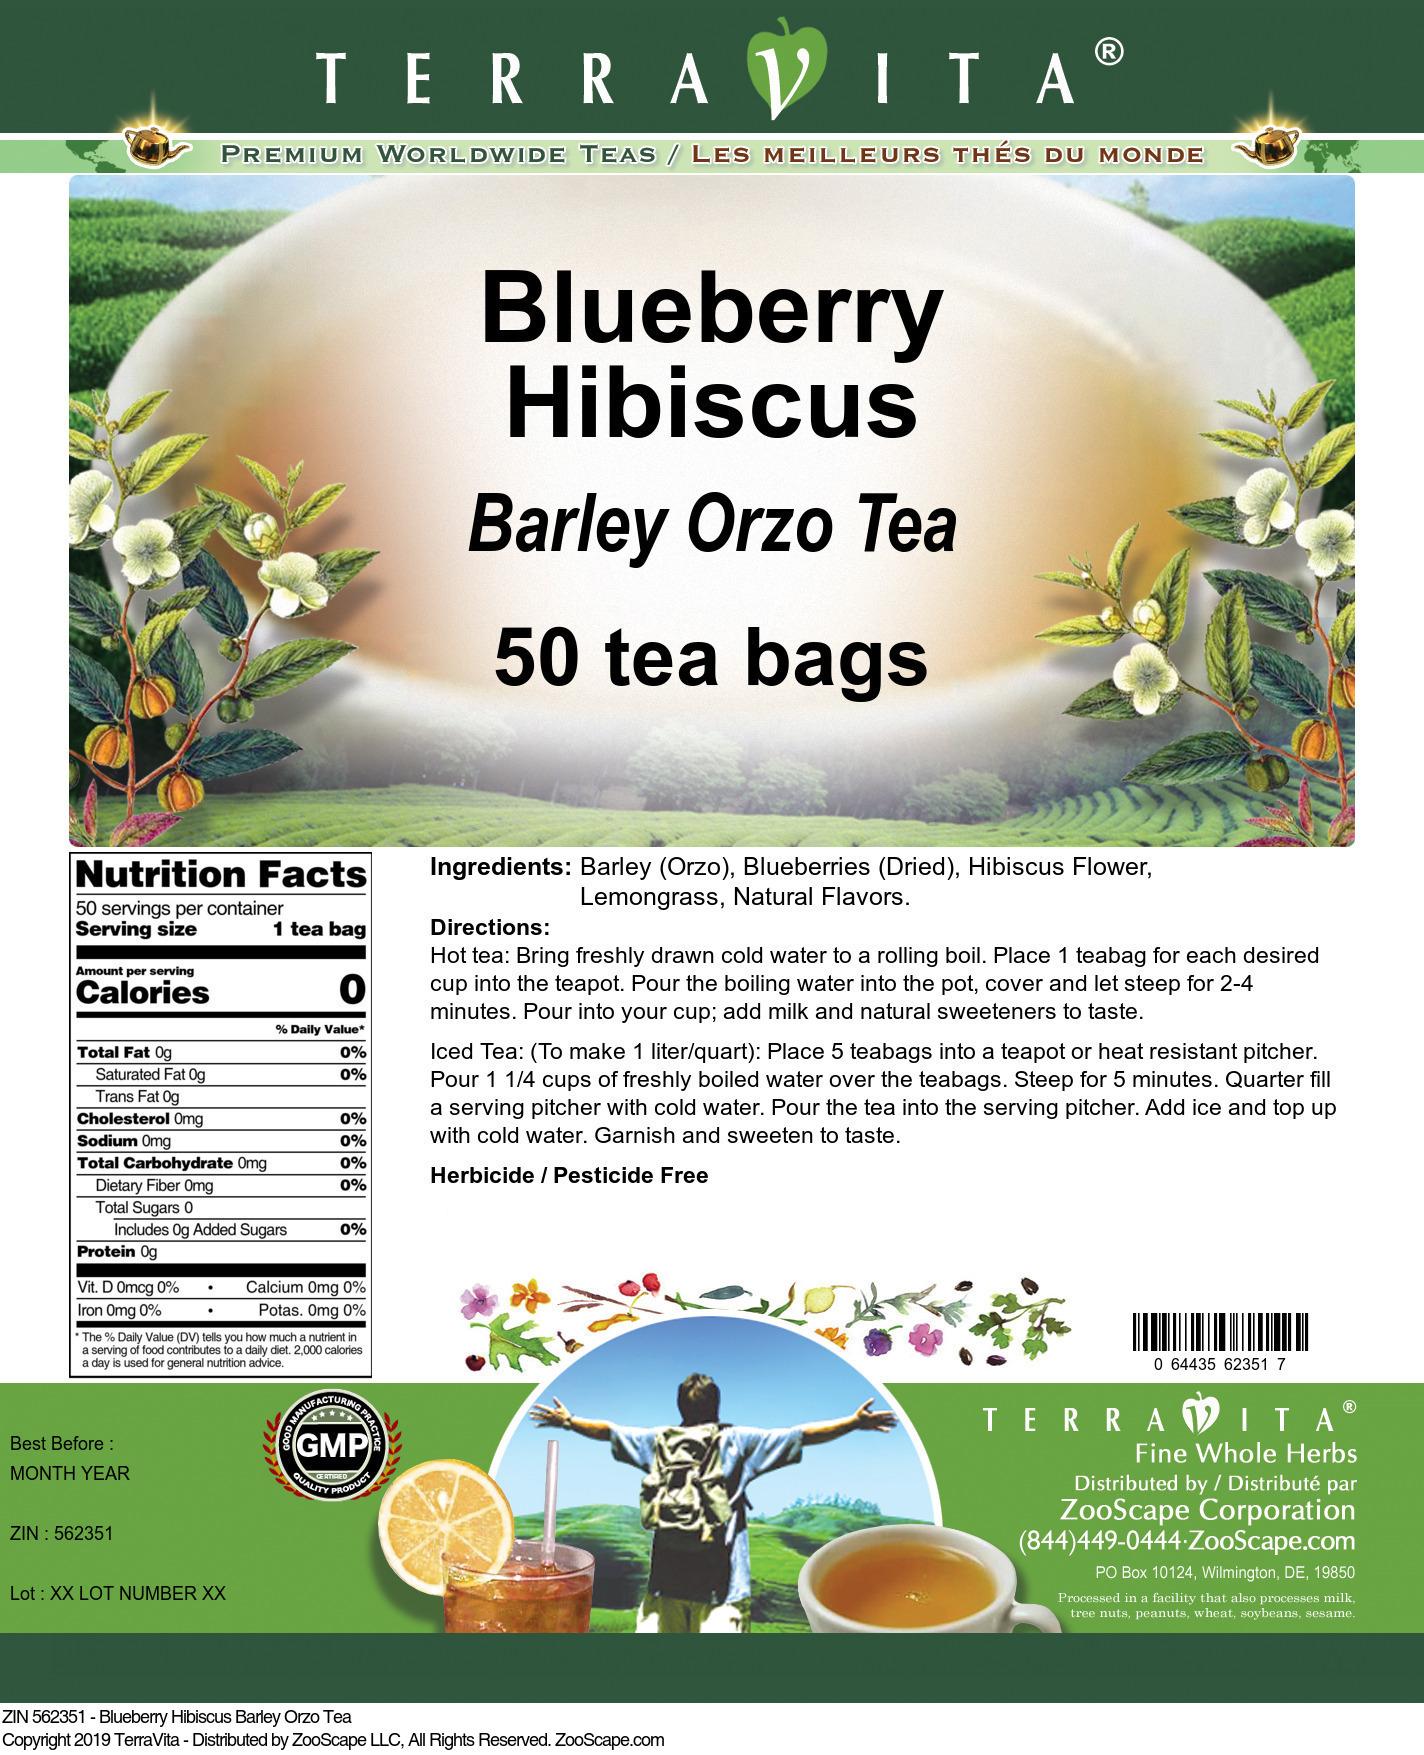 Blueberry Hibiscus Barley Orzo Tea